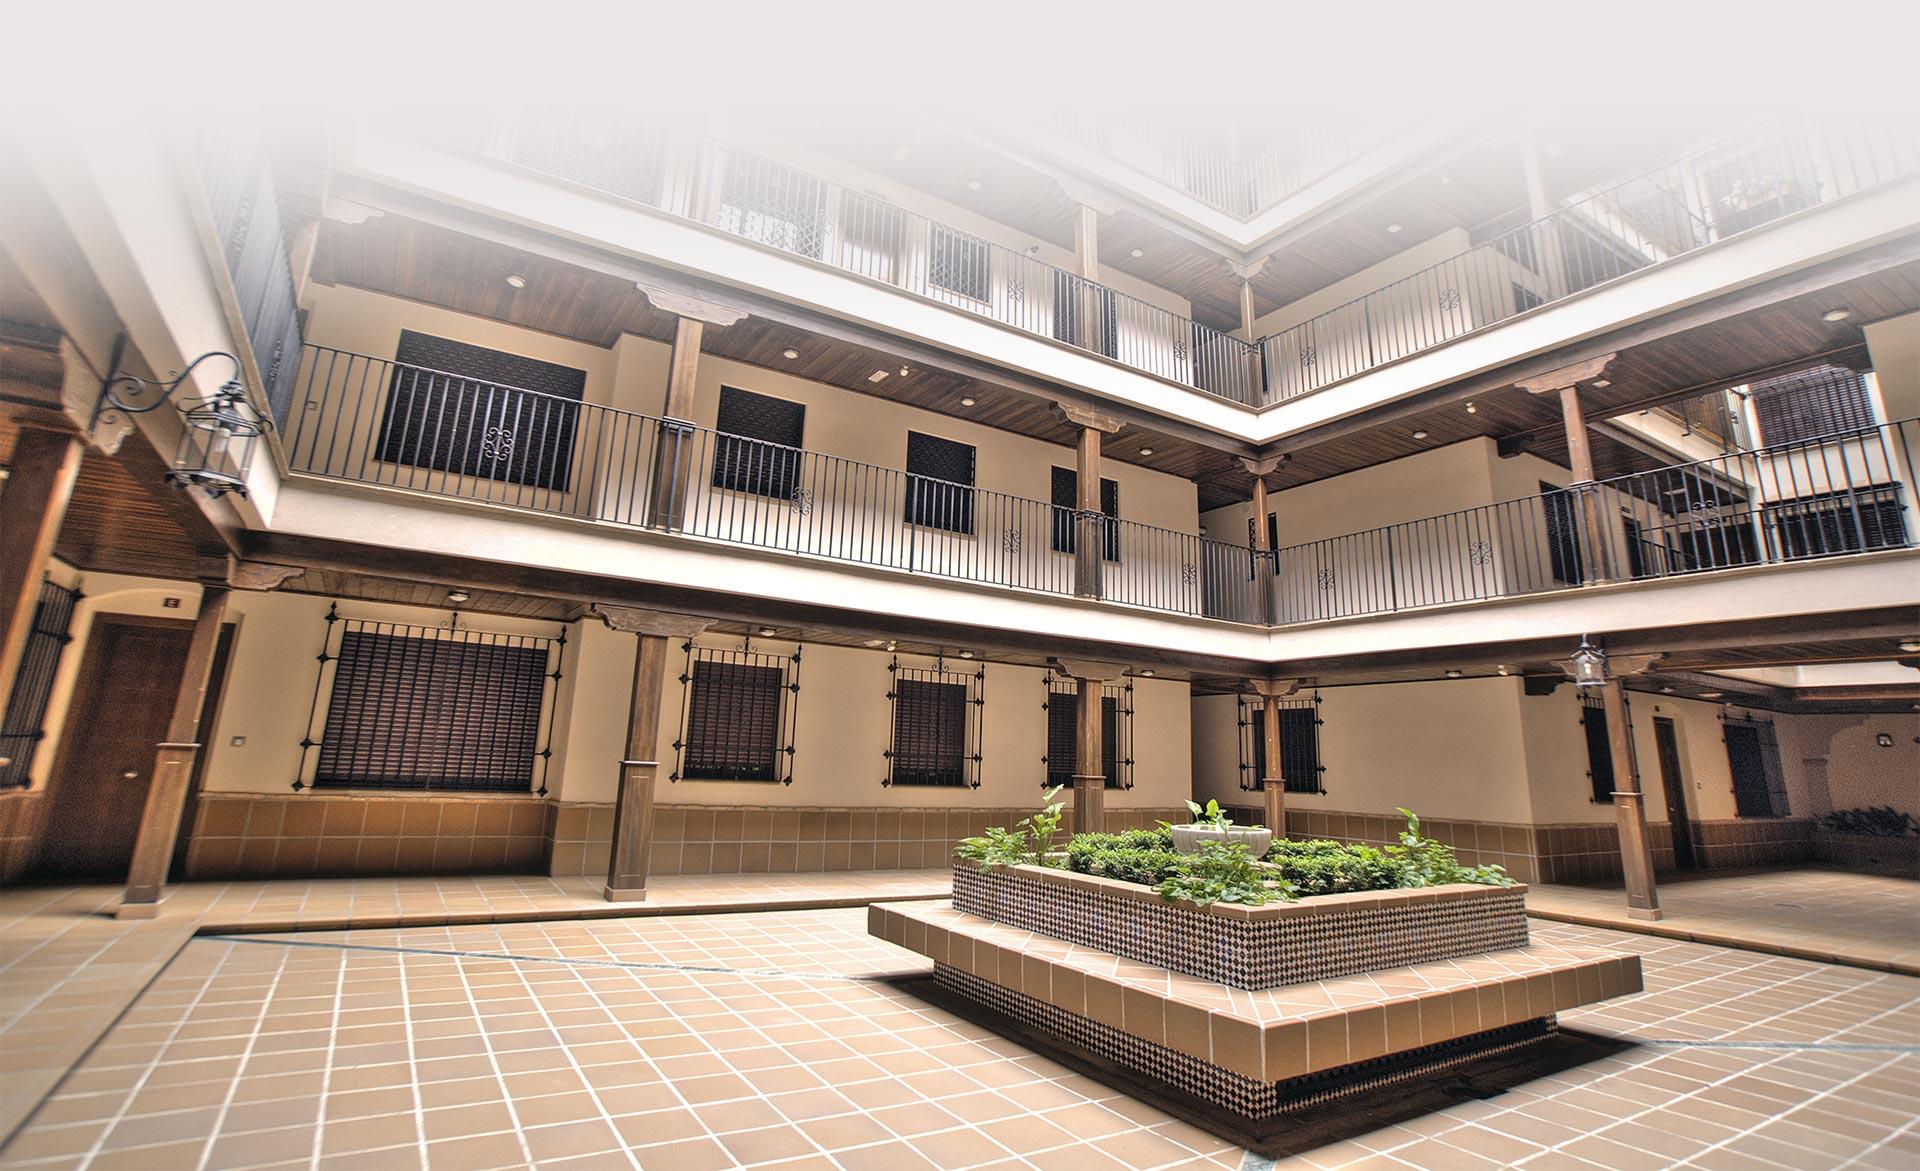 Rehabilitación integral de patio interior de edificio. Muntasil empresa constructora para comunidades y administradores de fincas